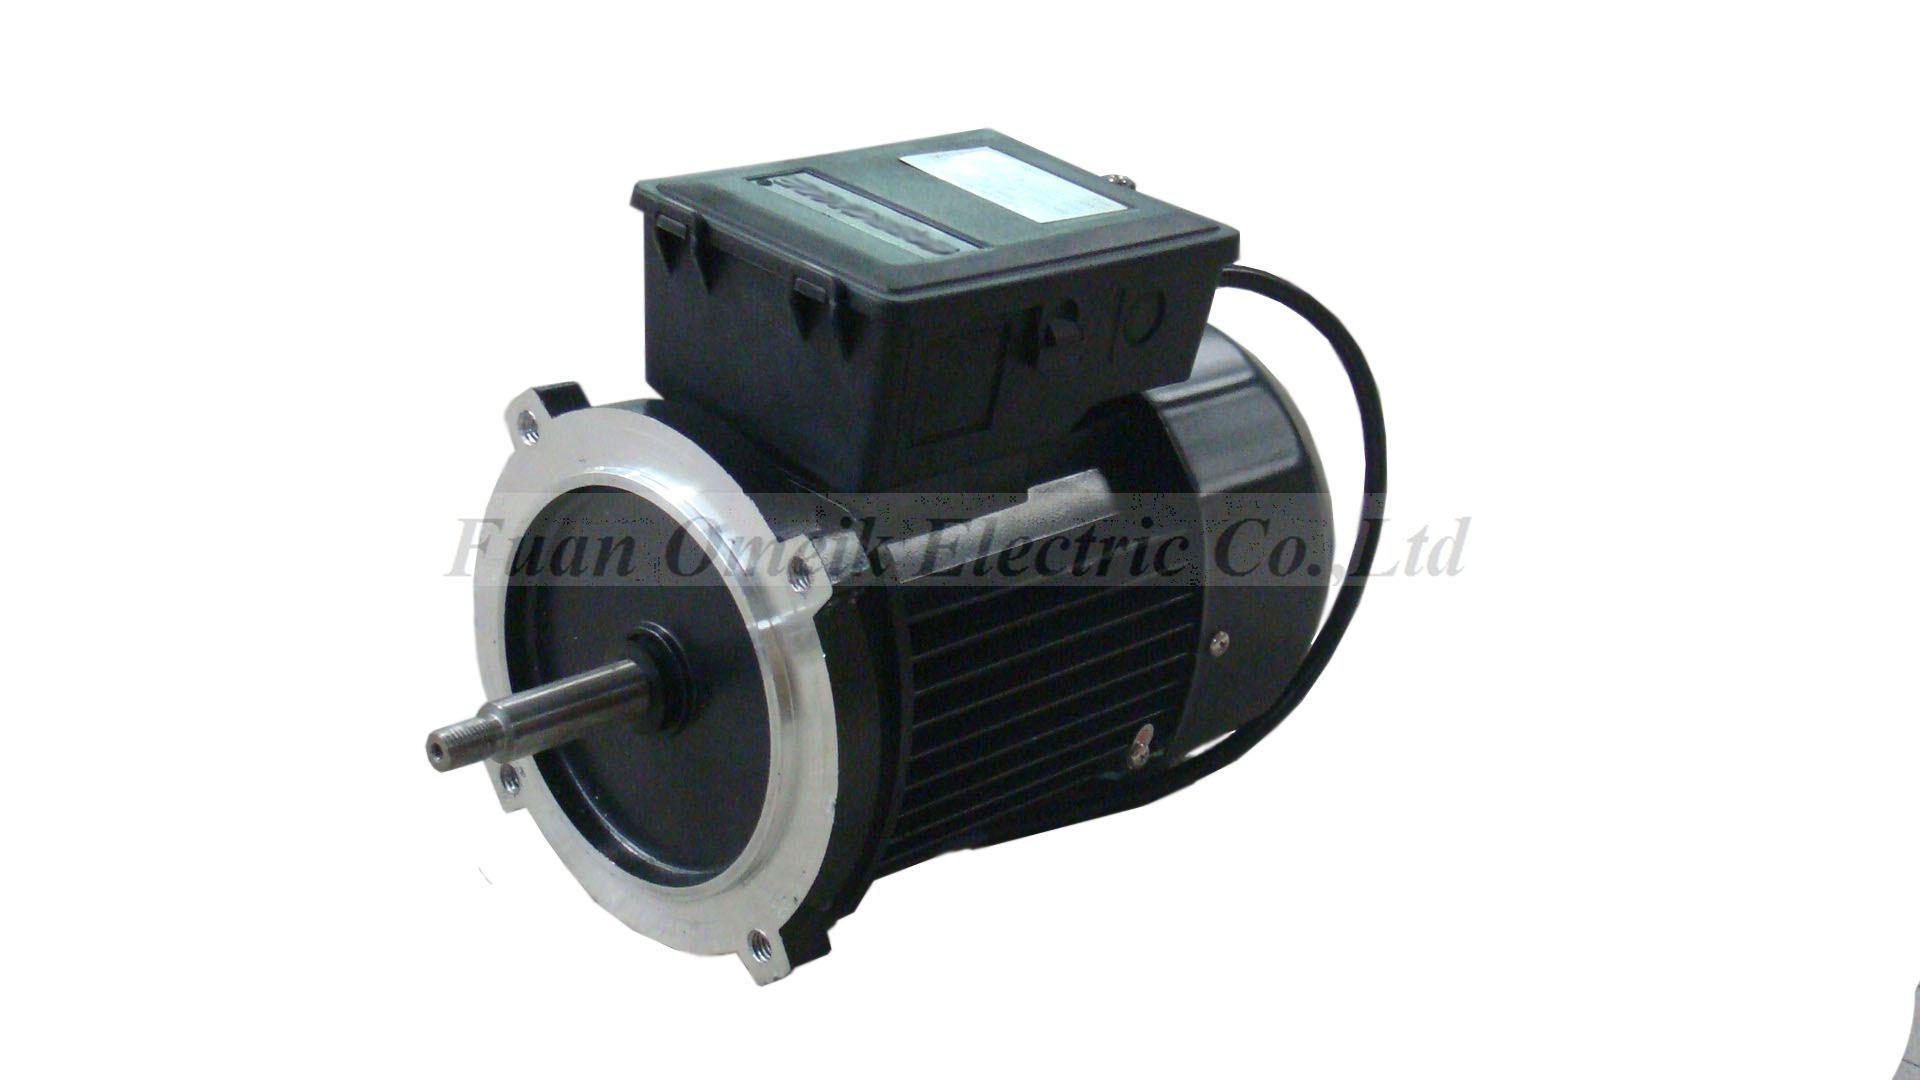 China 1 5hp Fcp Water Pumps Motor China Motor Electric